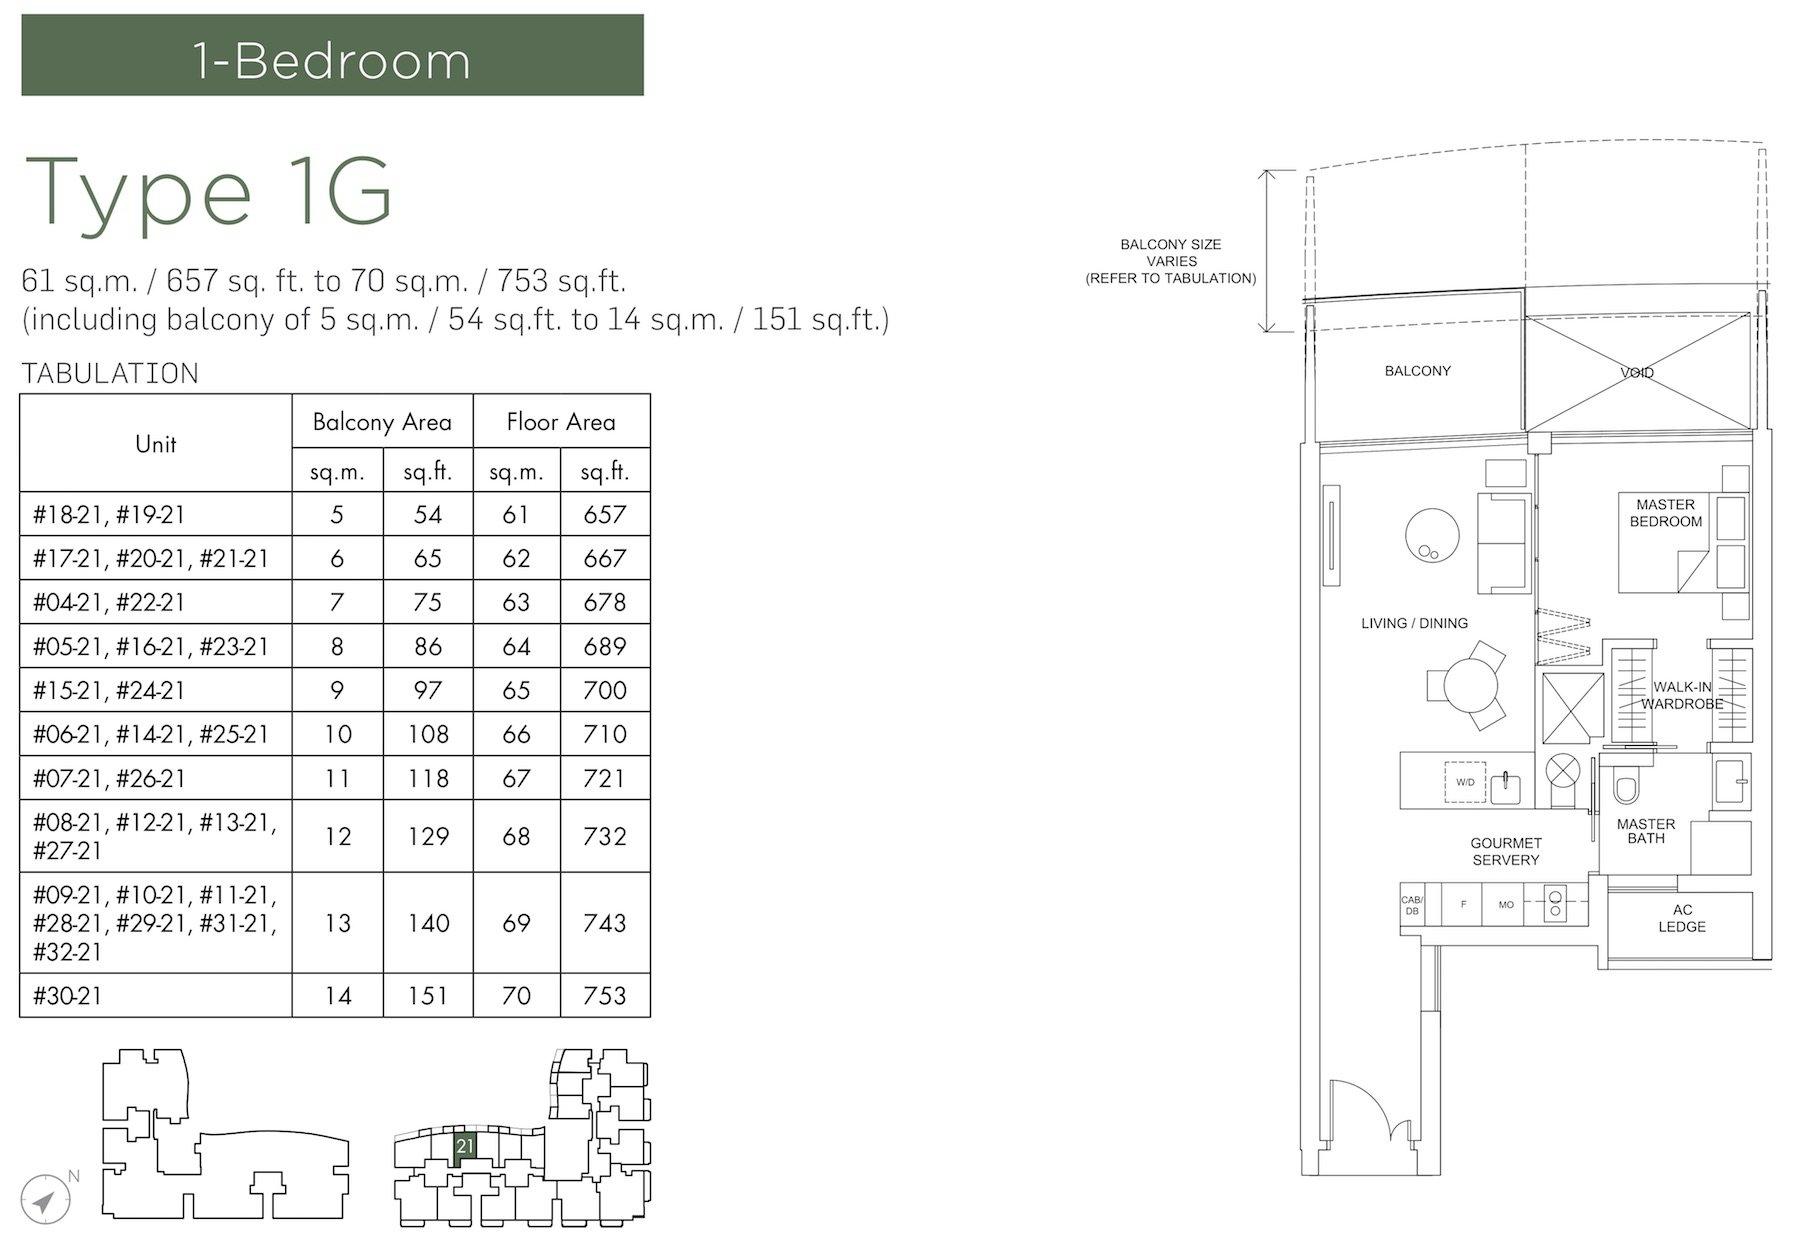 Marina One Residences 滨海盛景豪苑 floor plans 1 bedroom 1G